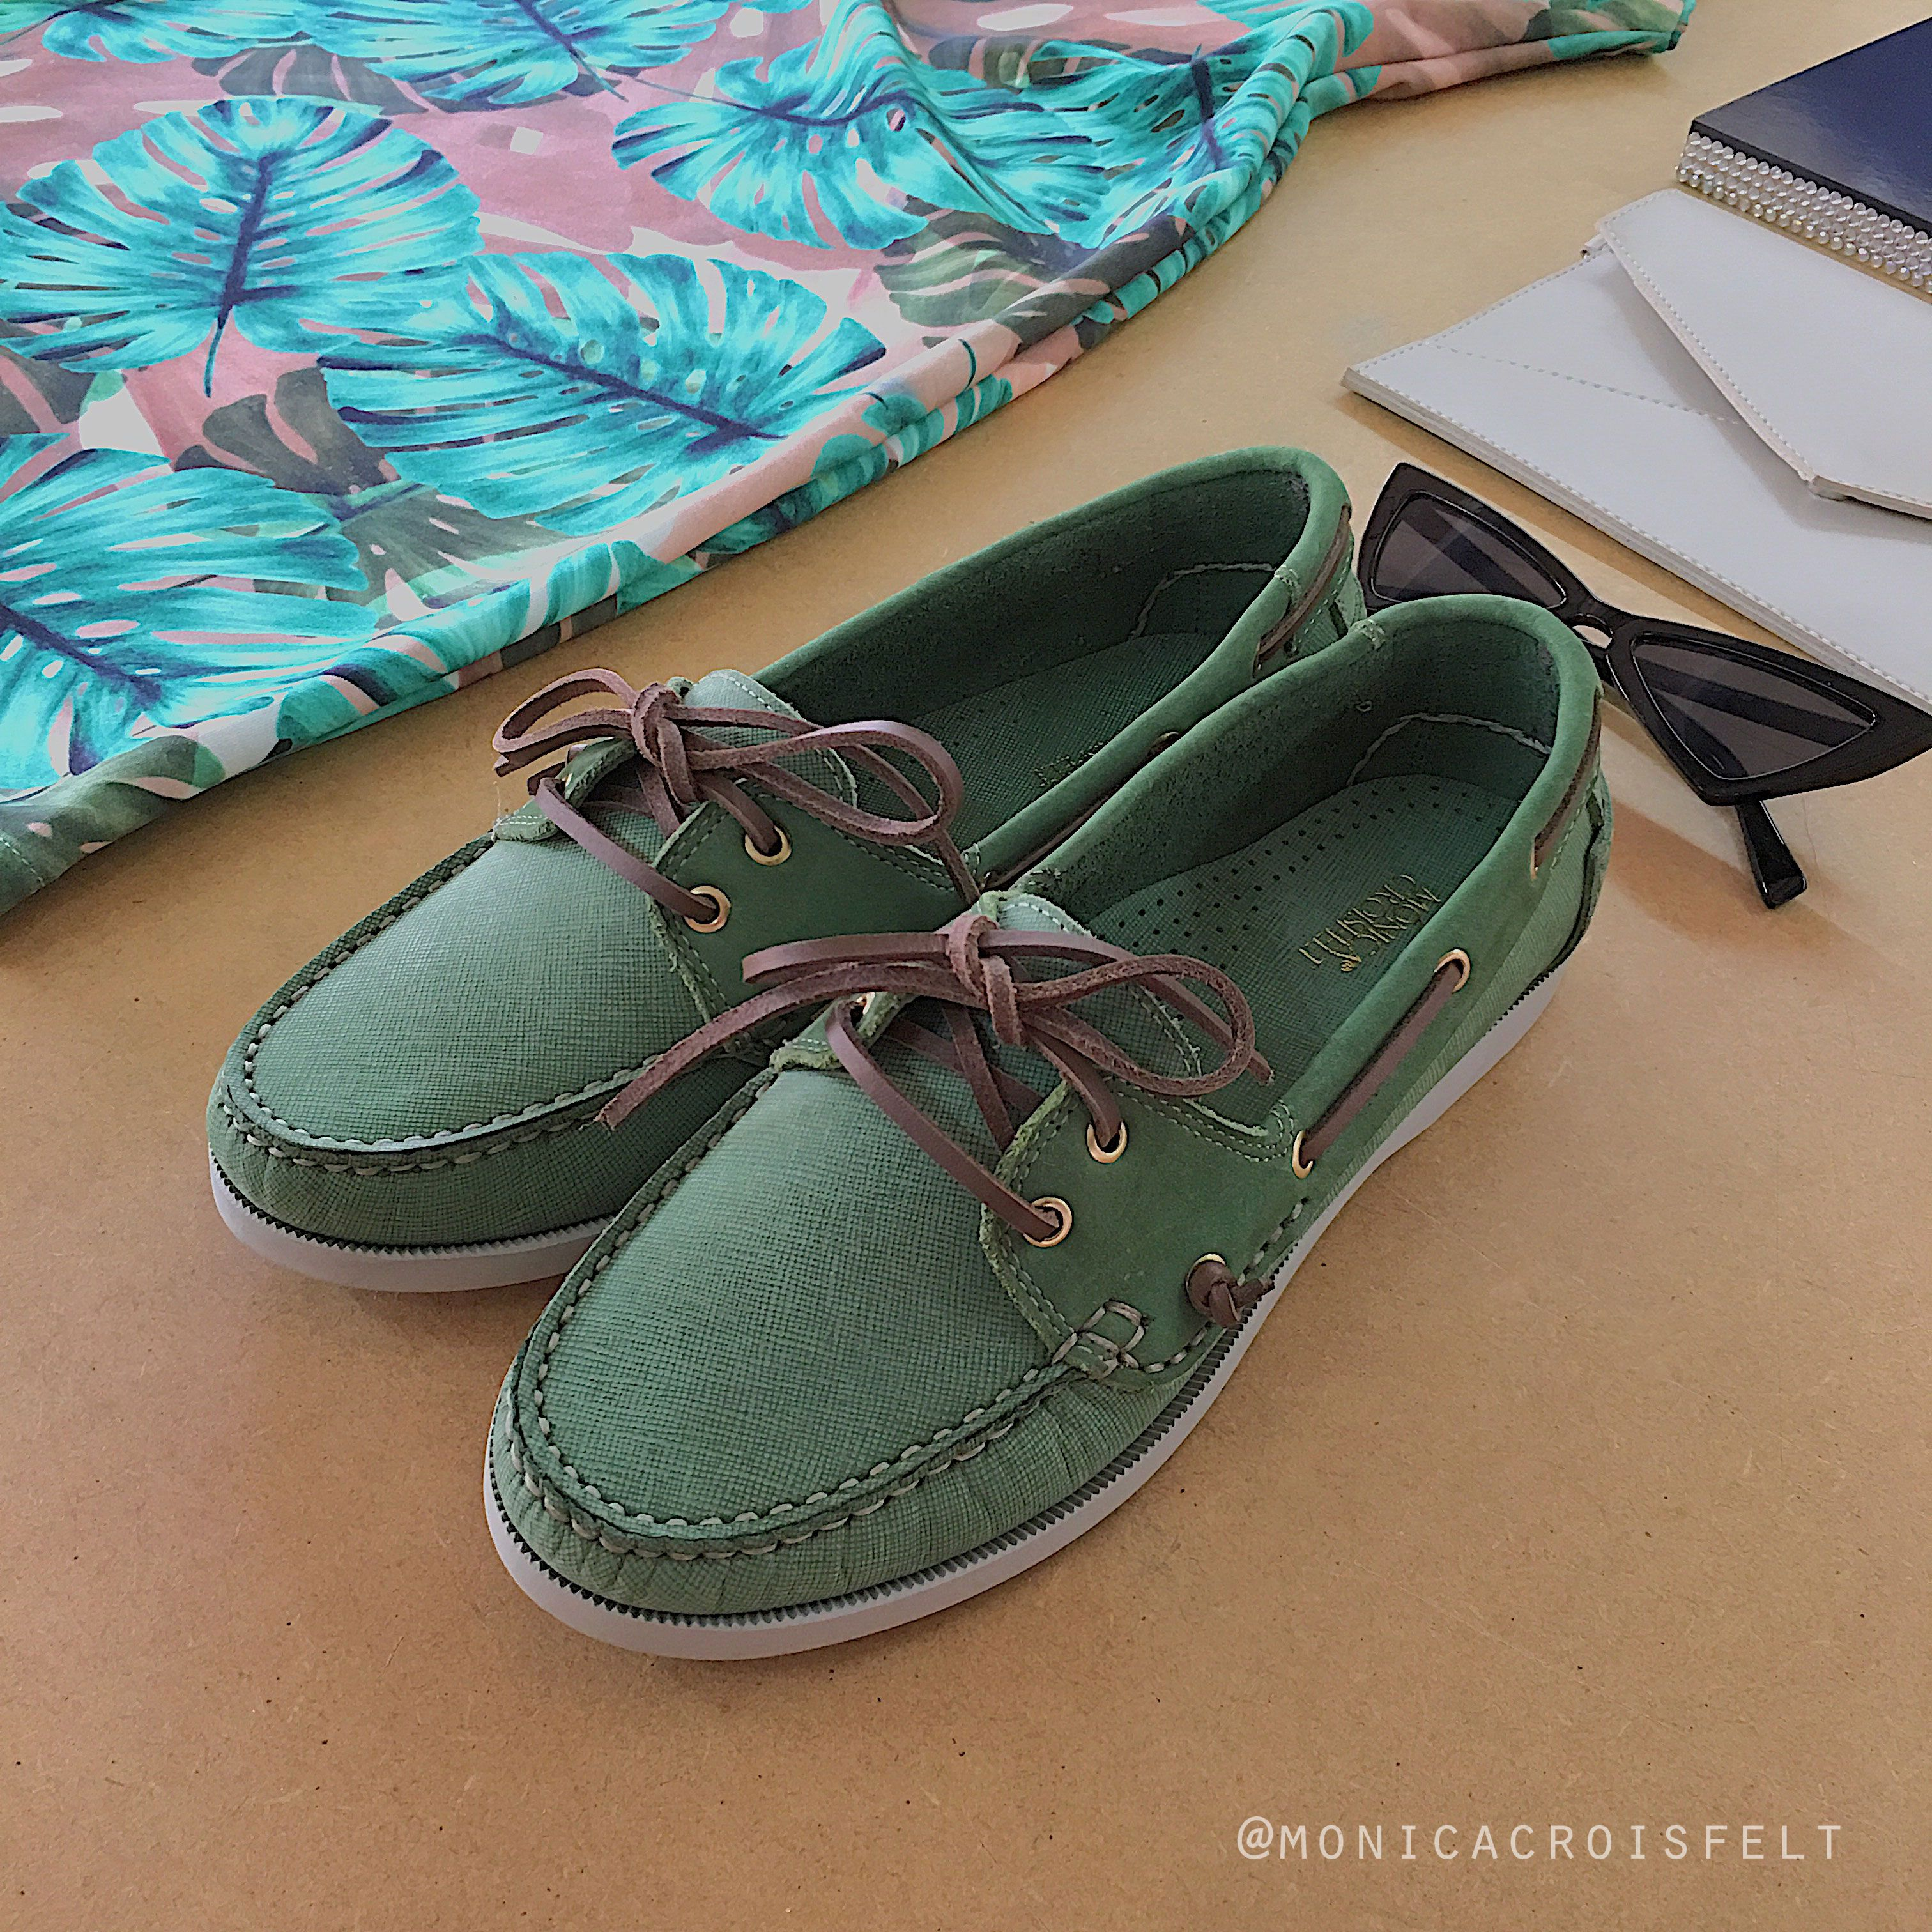 0b164c80b ... Sapato Feminino Mocassim Dockside Drive Conforto Alto Luxo de Mônica  Croisfelt. À venda na loja ❤ #verde #streetstyle #casual